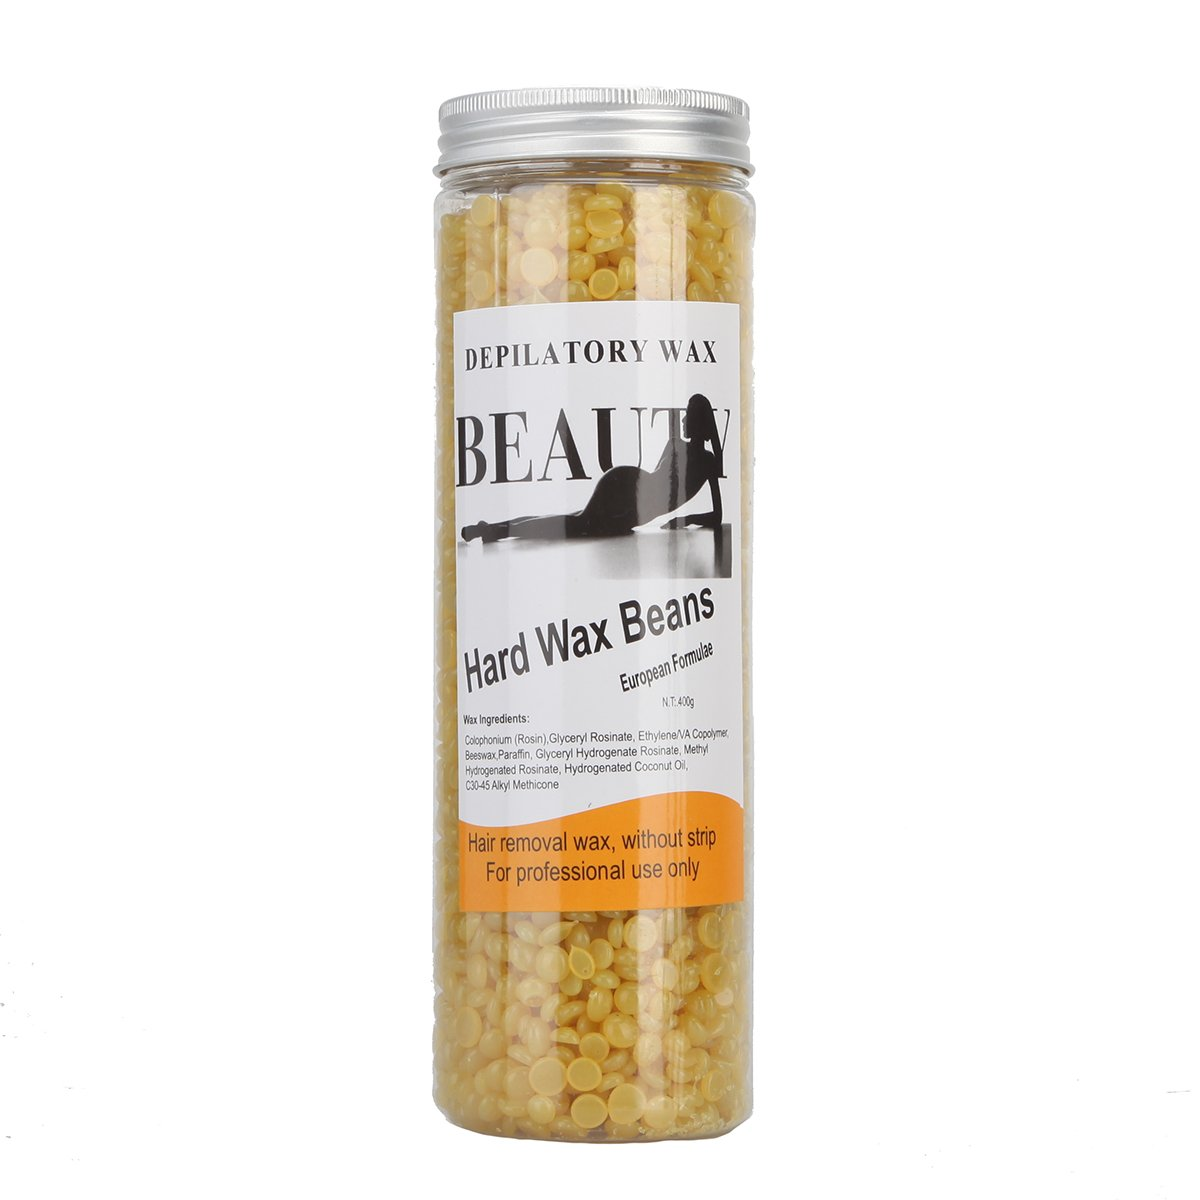 Bonjanvye Depilatory Hard Wax Beans Professional Striptless Hair Removal Wax Beads 400g Rose